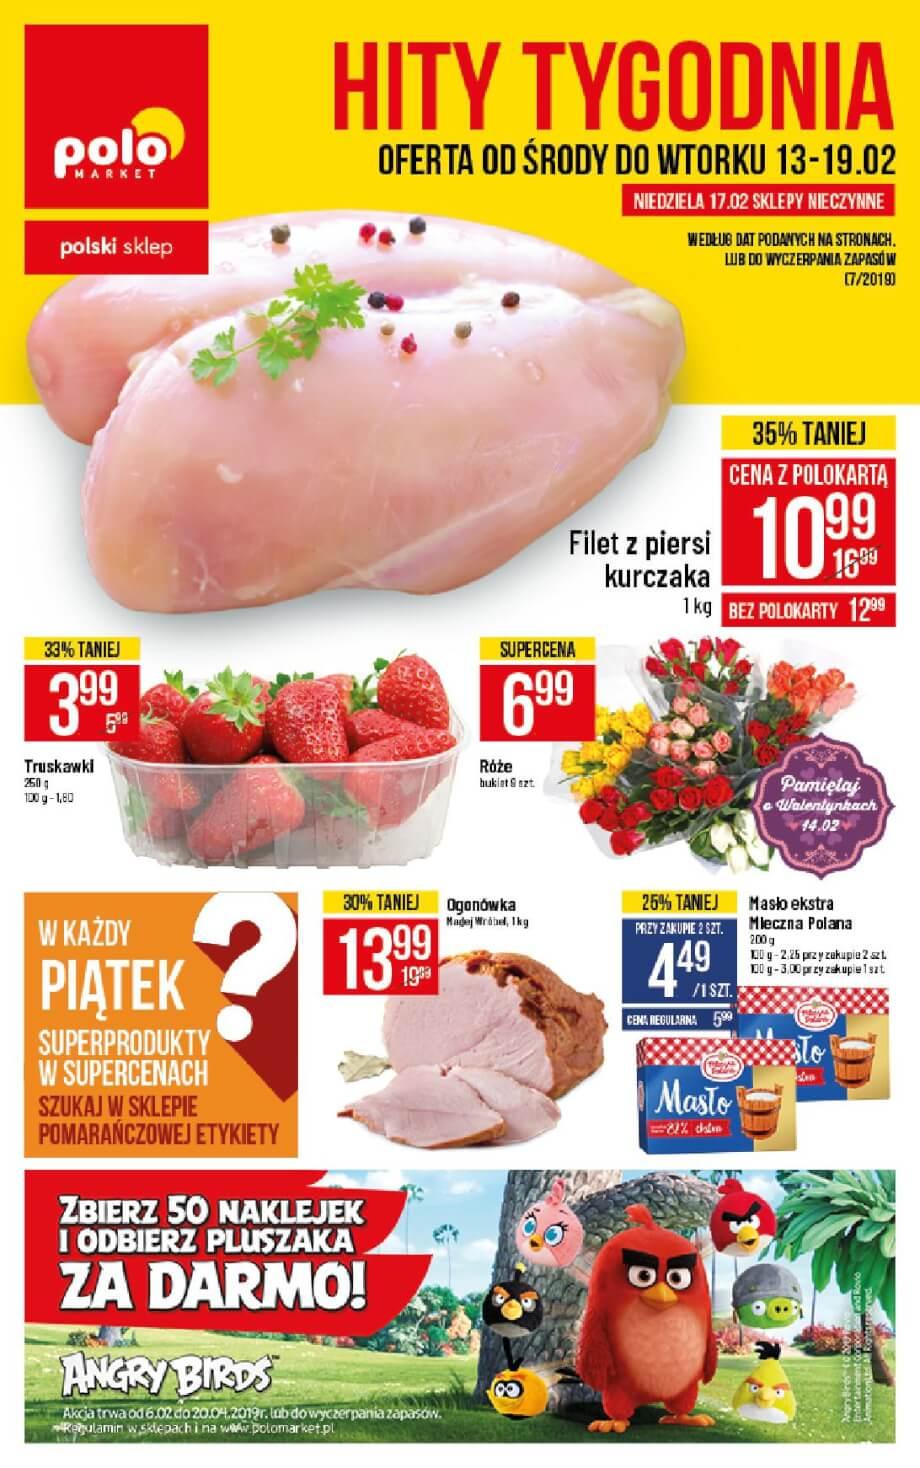 Polomarket, gazetka do 19.02.2019